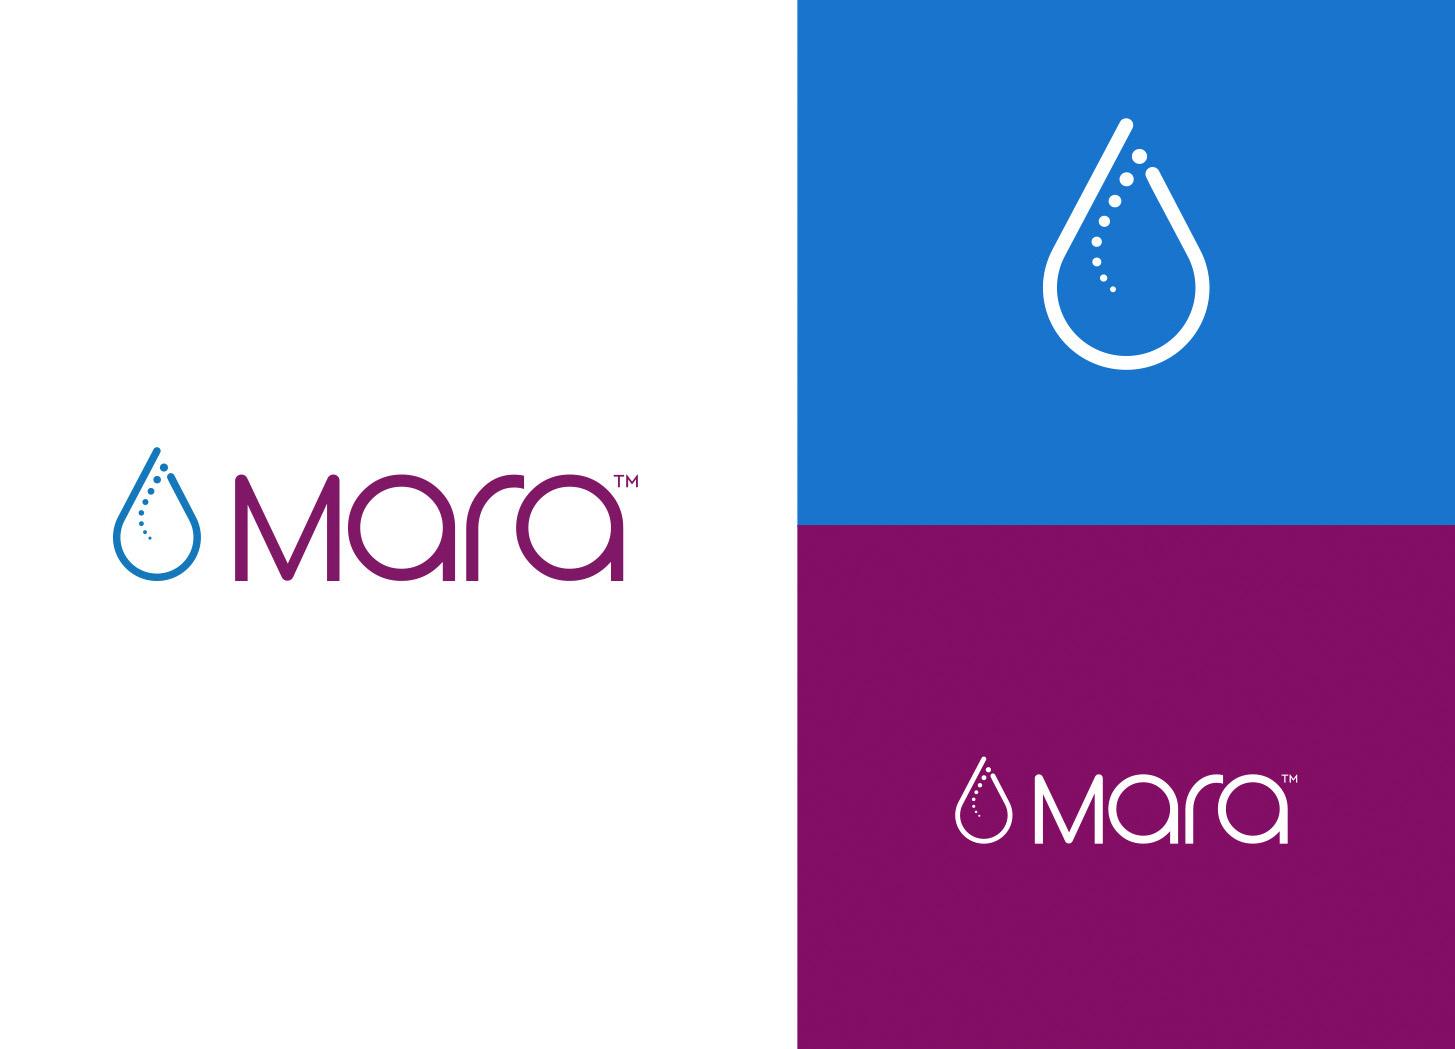 Mara Identity System